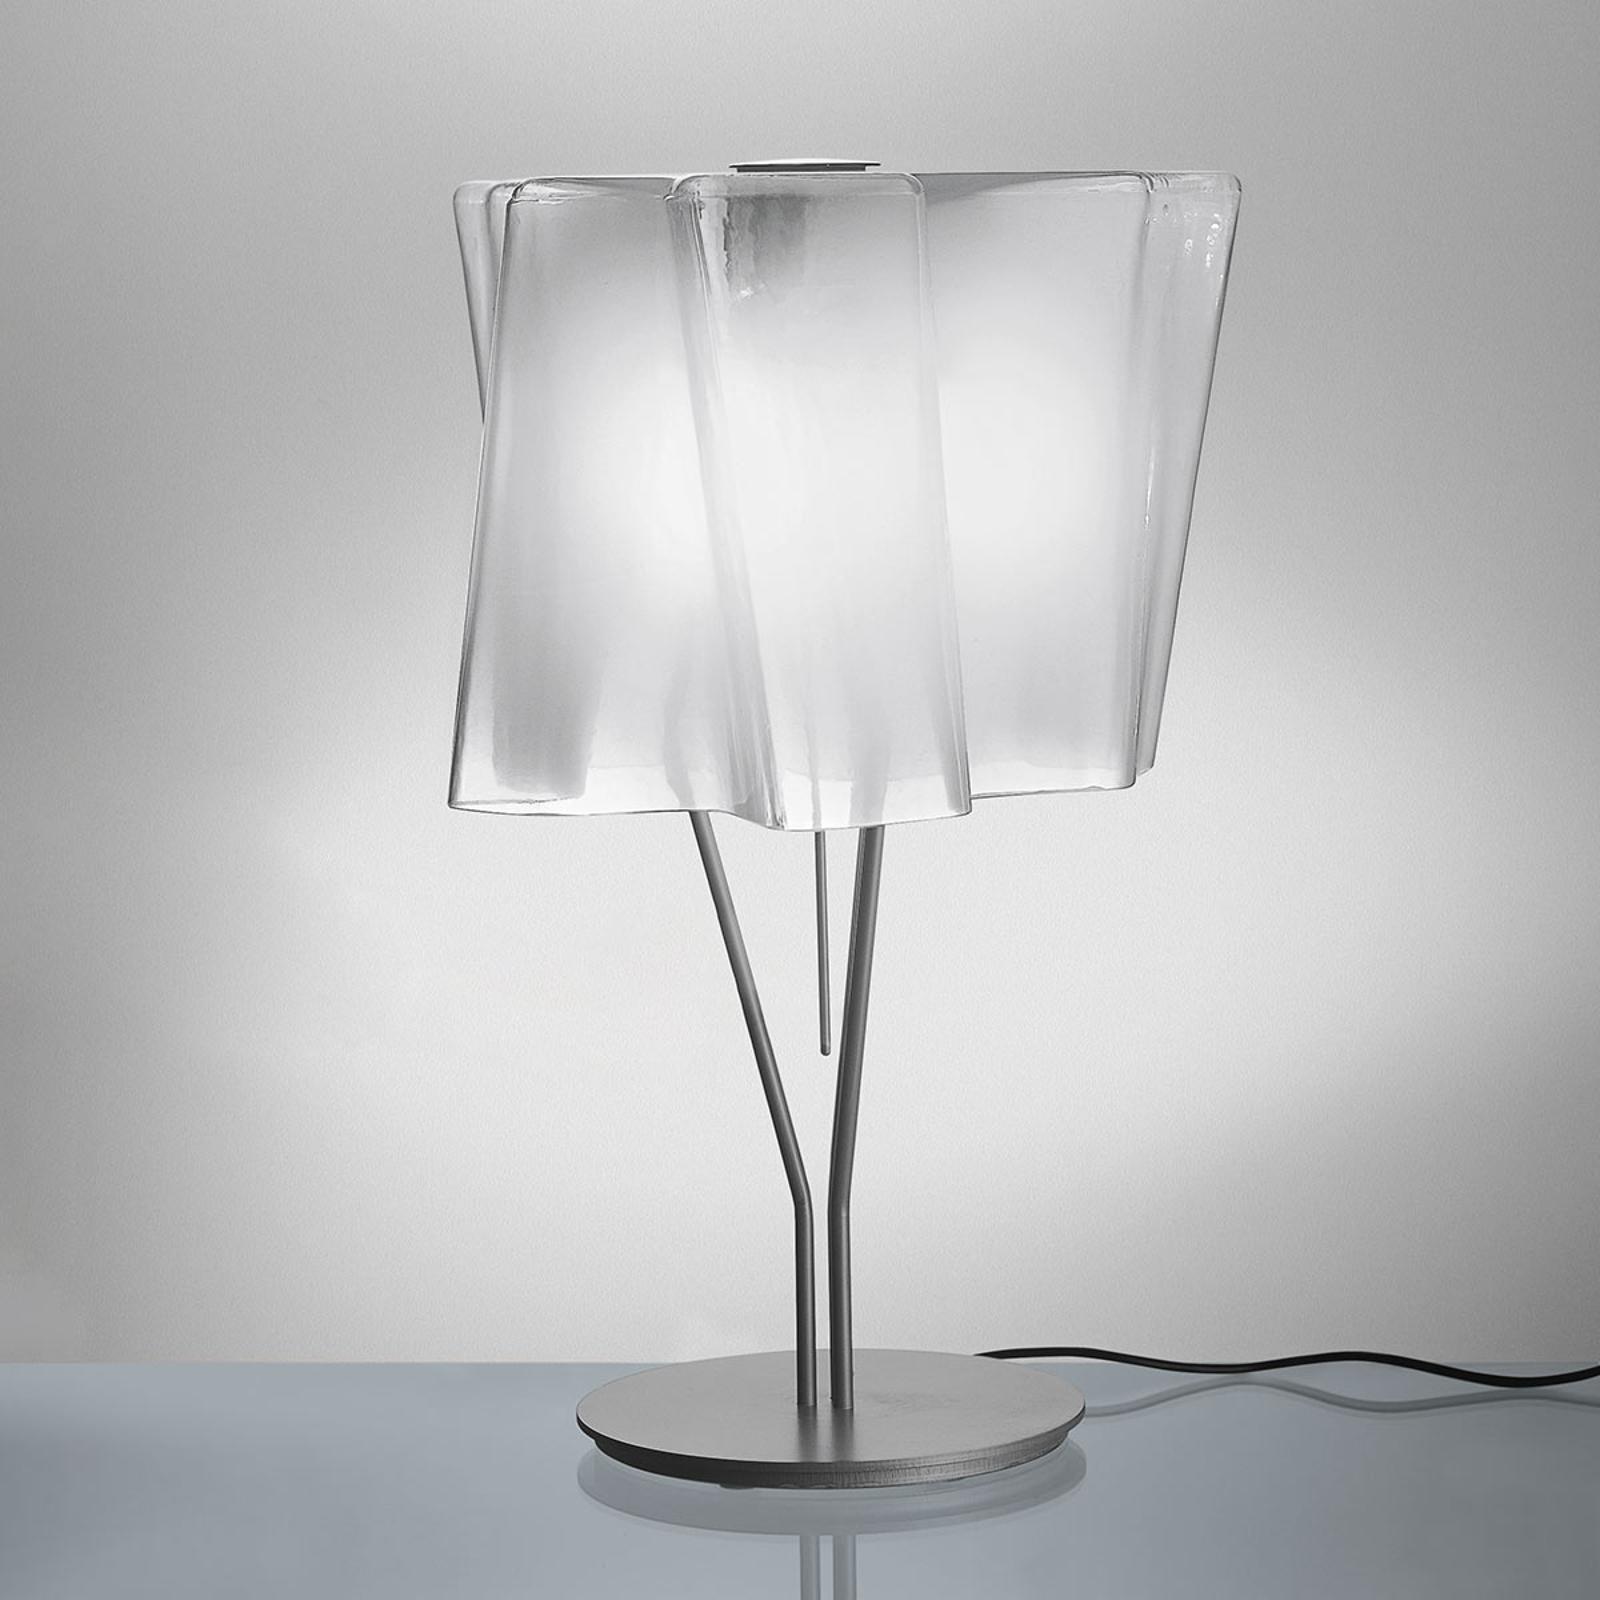 Artemide Logico bordslampa 44 cm sidenglans/alu